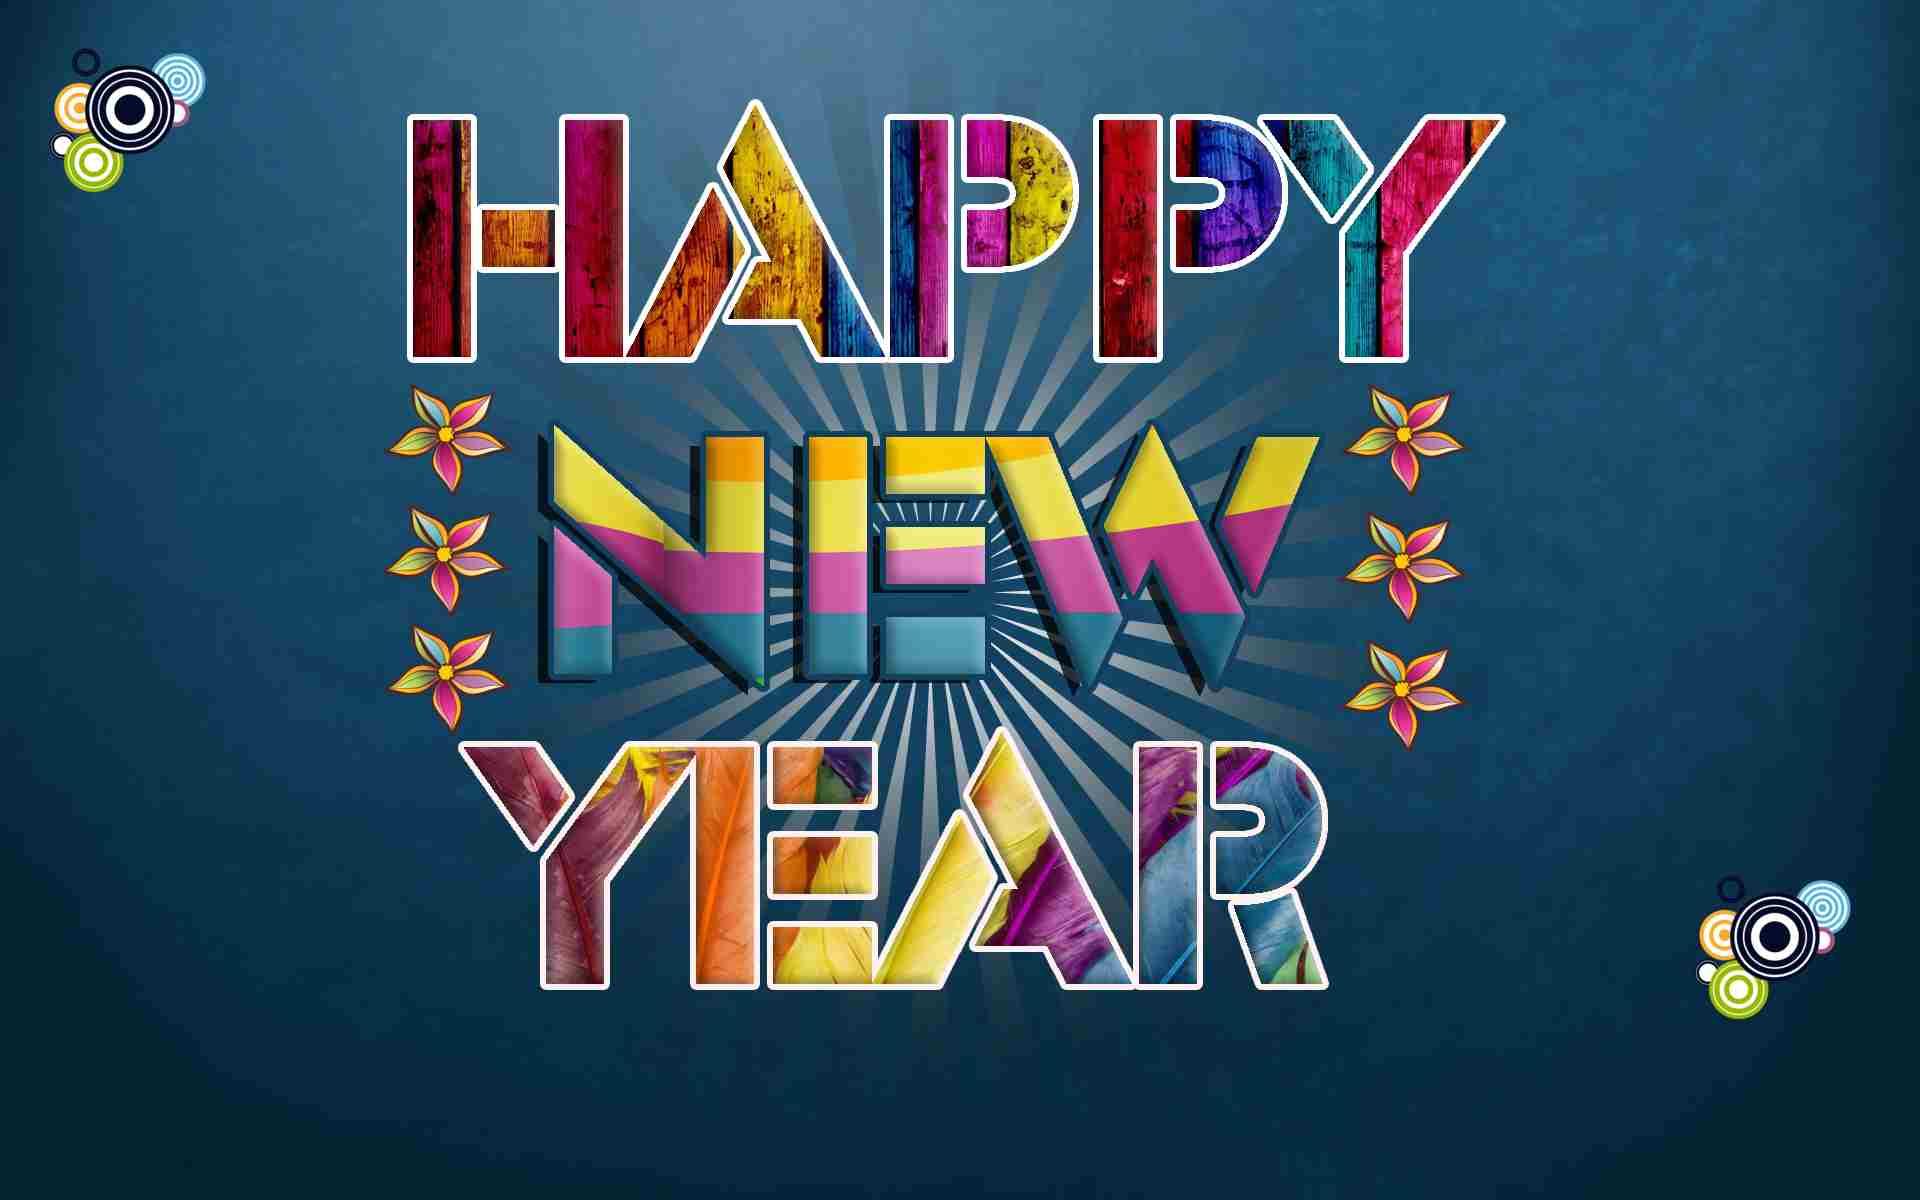 Happy New Year 2018 Wallpaper, New Year Hd Wallpapers - Happy New Year 2019 Hd , HD Wallpaper & Backgrounds